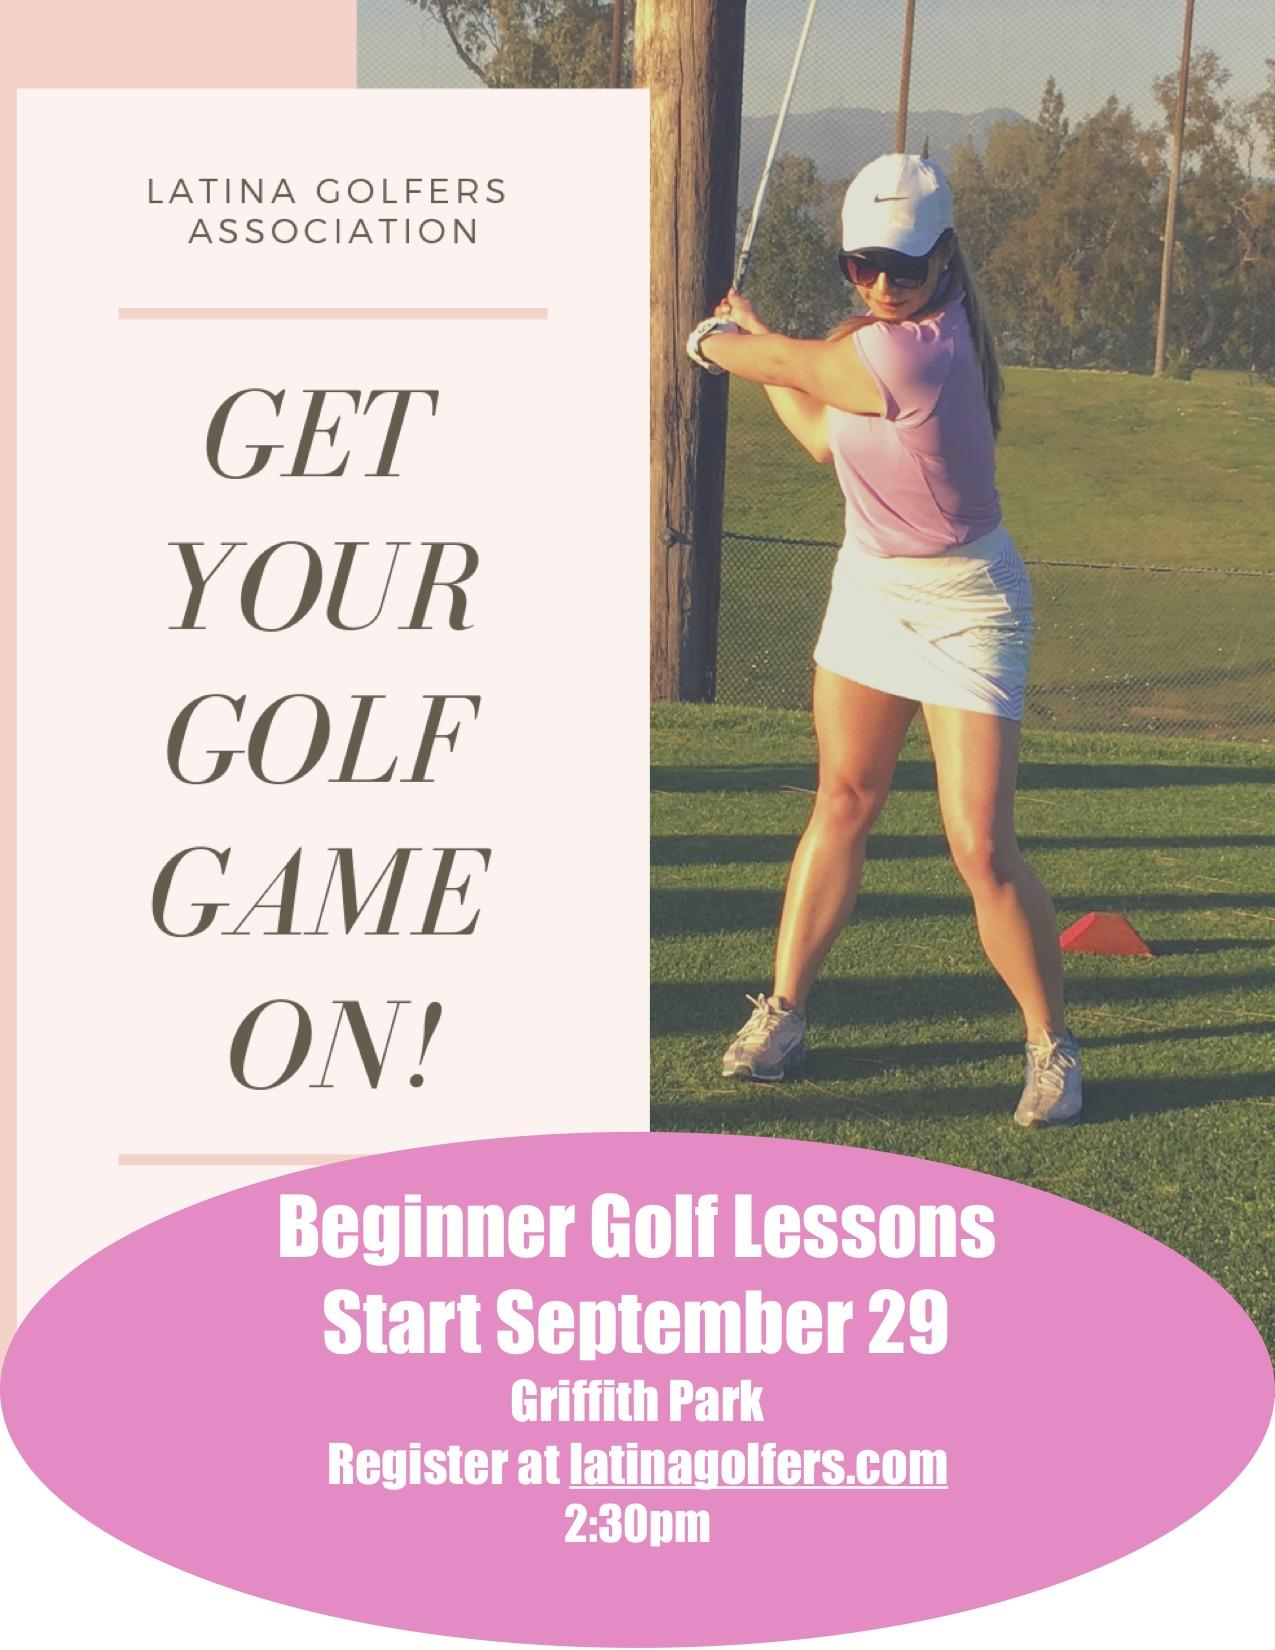 Latina Golfers Beginner Golf Lessons 2:30pm